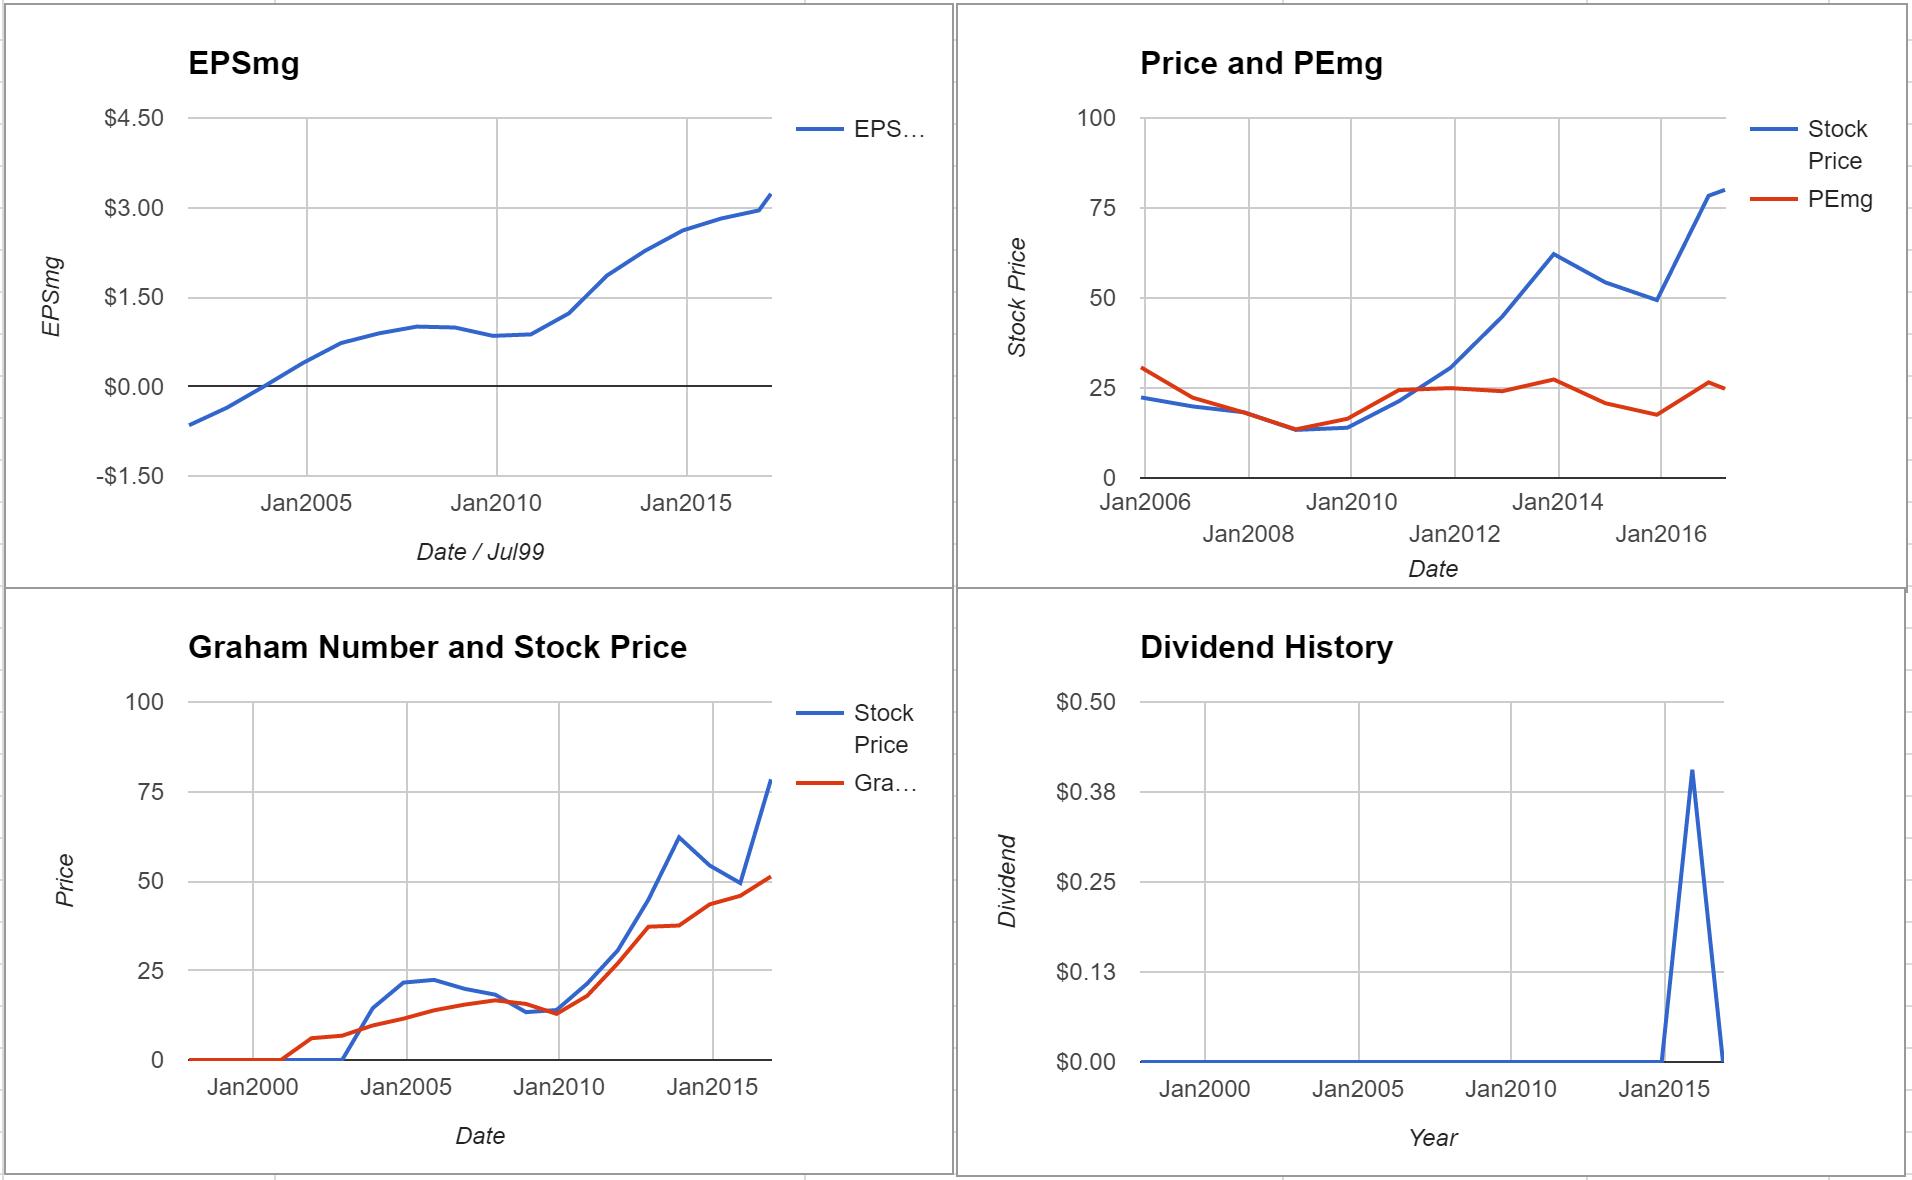 Texas Capital Banchares Inc Valuation – Initial Coverage $TCBI